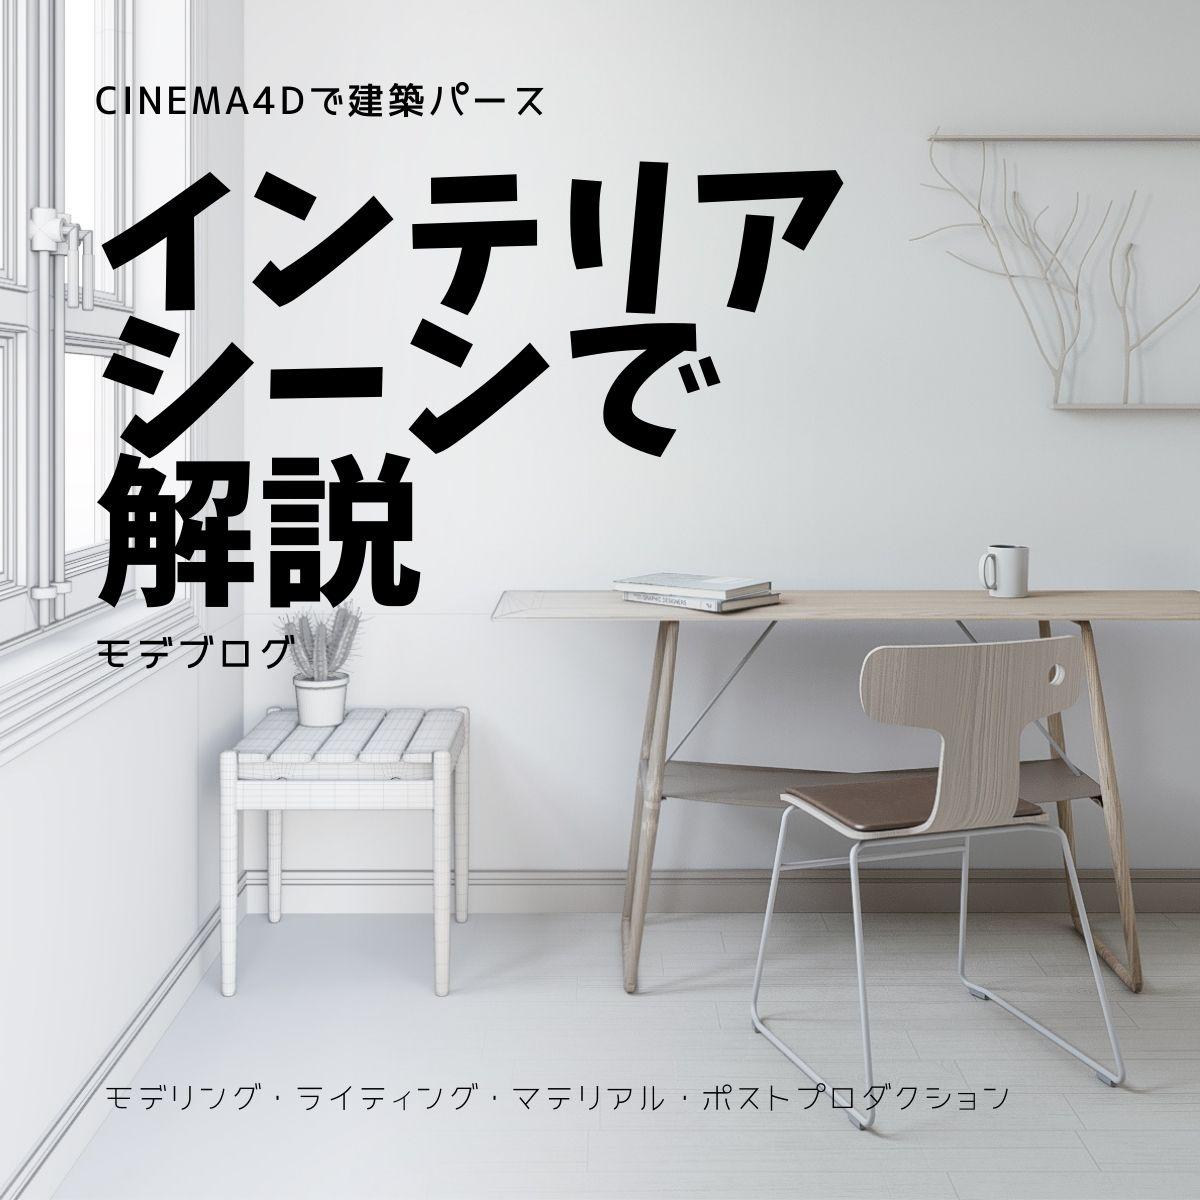 Cinema4Dで建築パース・インテリアパース制作で徹底解説